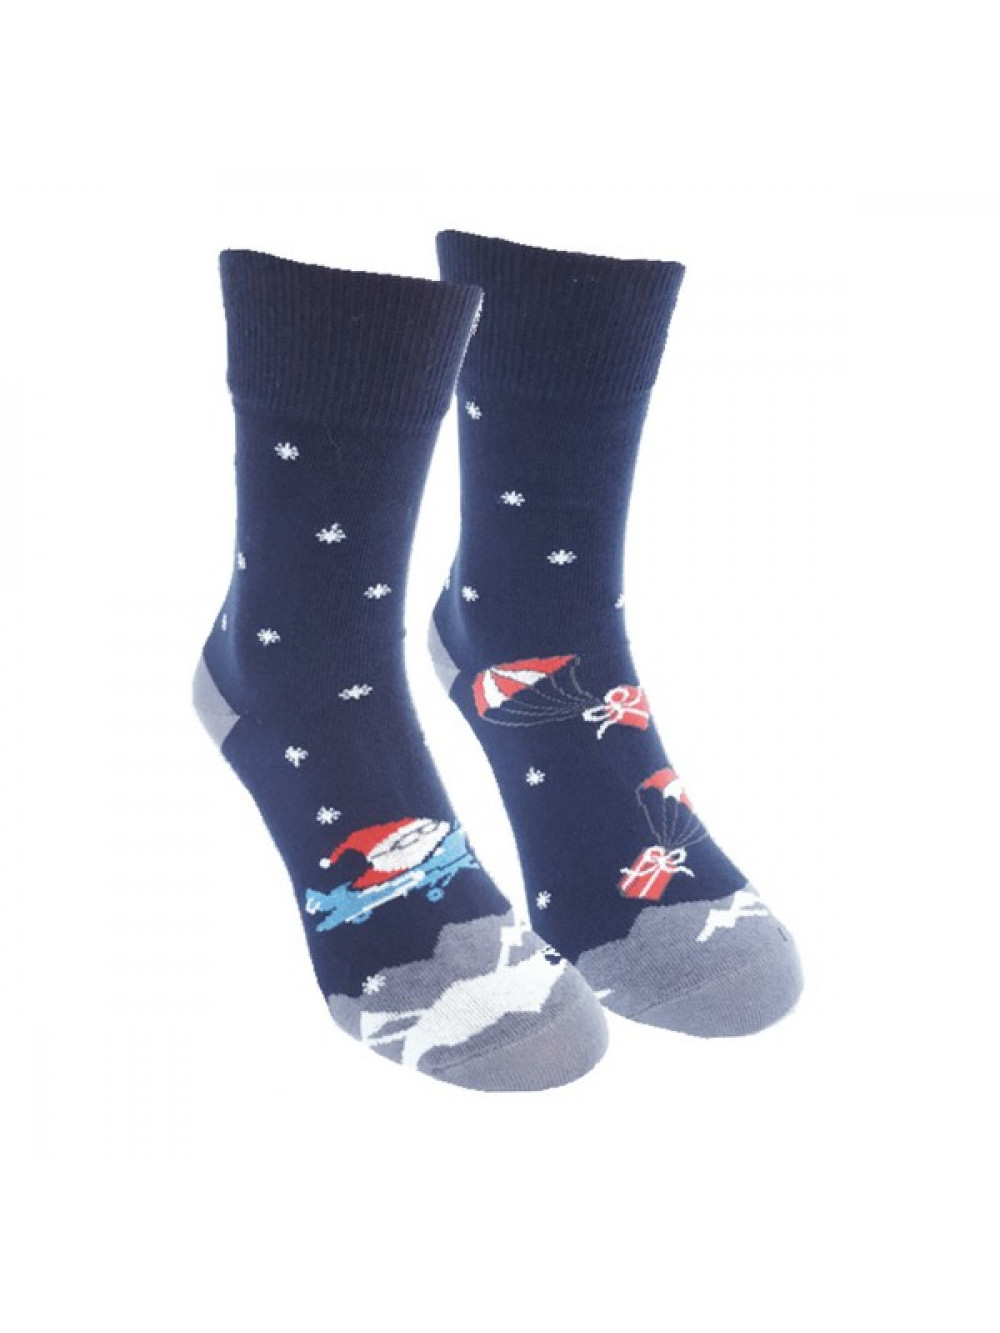 Ponožky Foxysoxy Lietajúci Mikuláš Modré